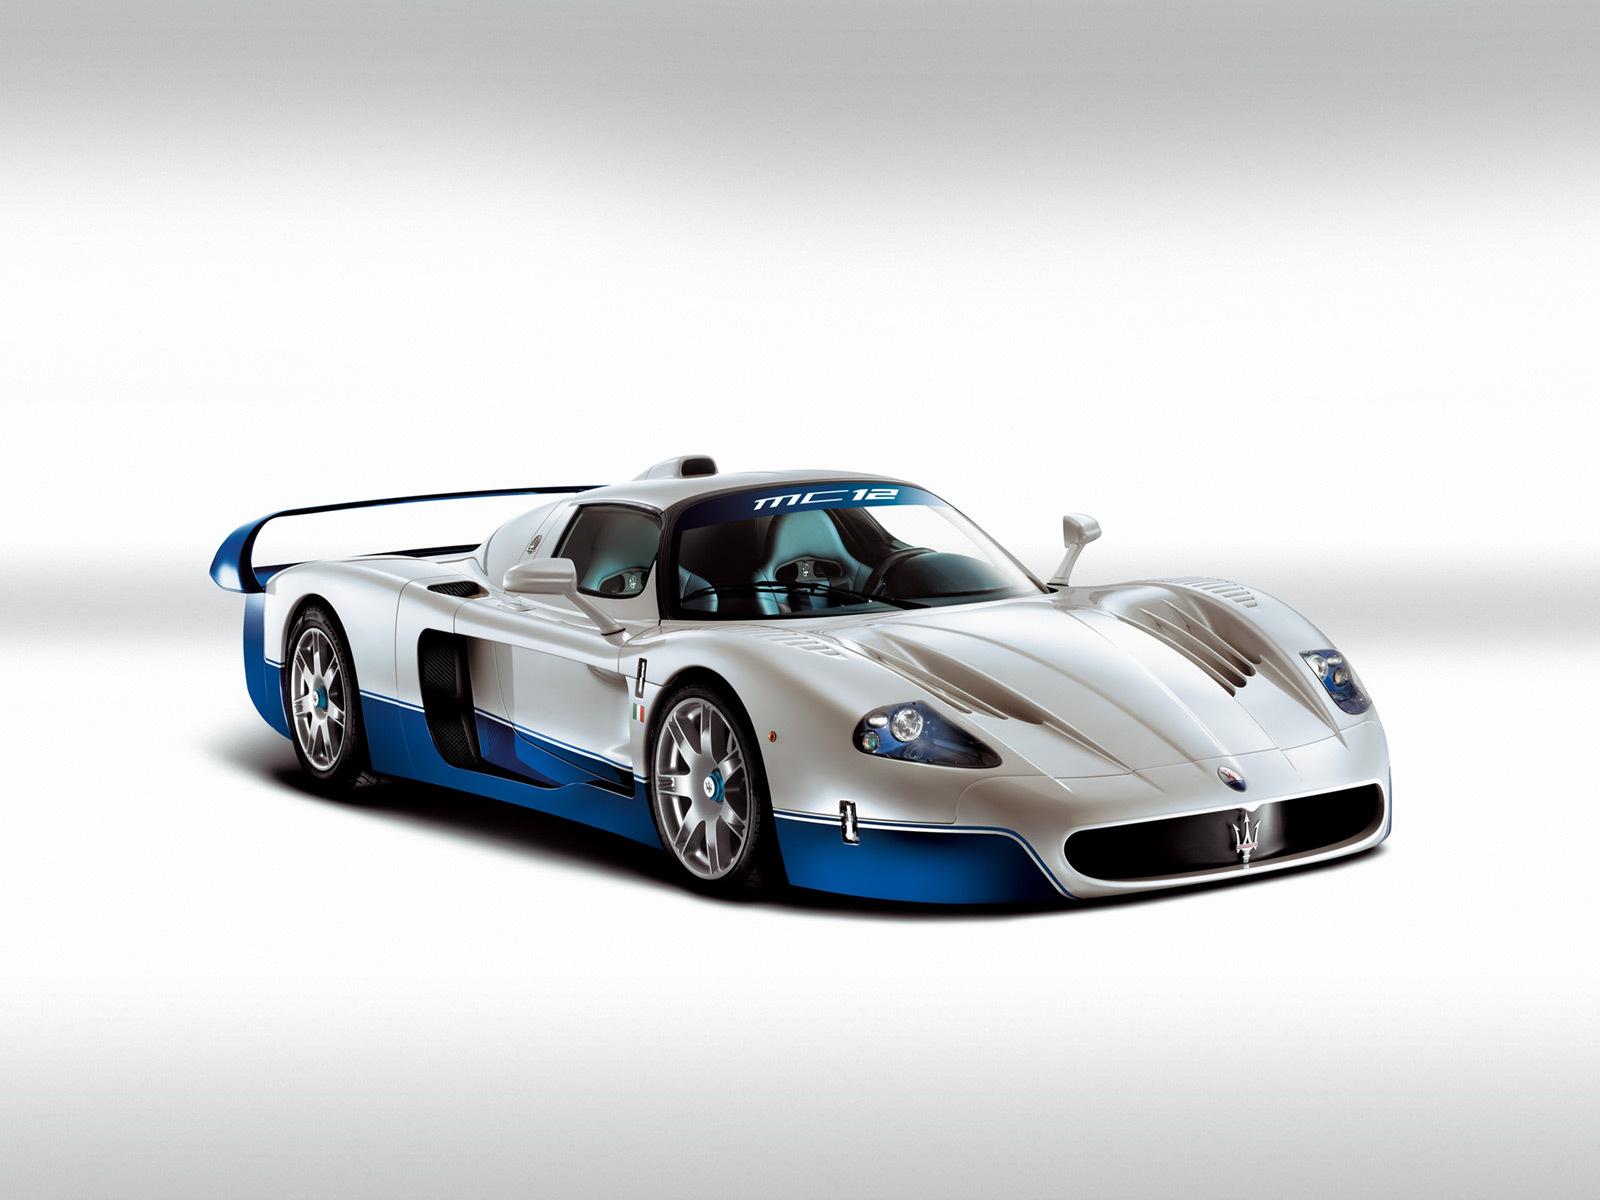 Maserati_MC12_V12_Super_Car.jpg